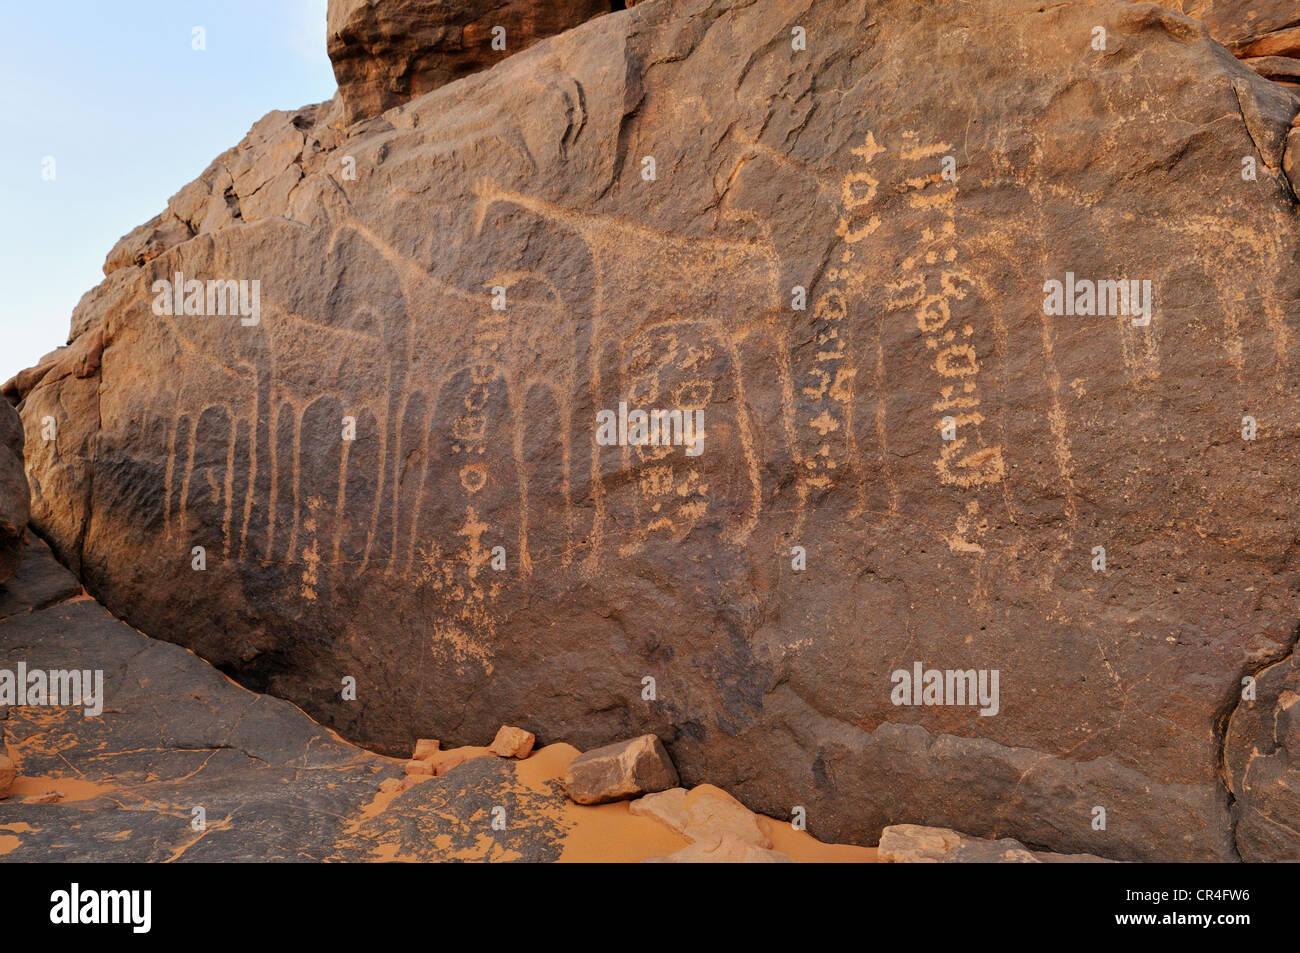 Rock engraving of a giraffe and Tifinagh writings, Adrar Tekemberet, Immidir, Algeria, Sahara, North Africa - Stock Image